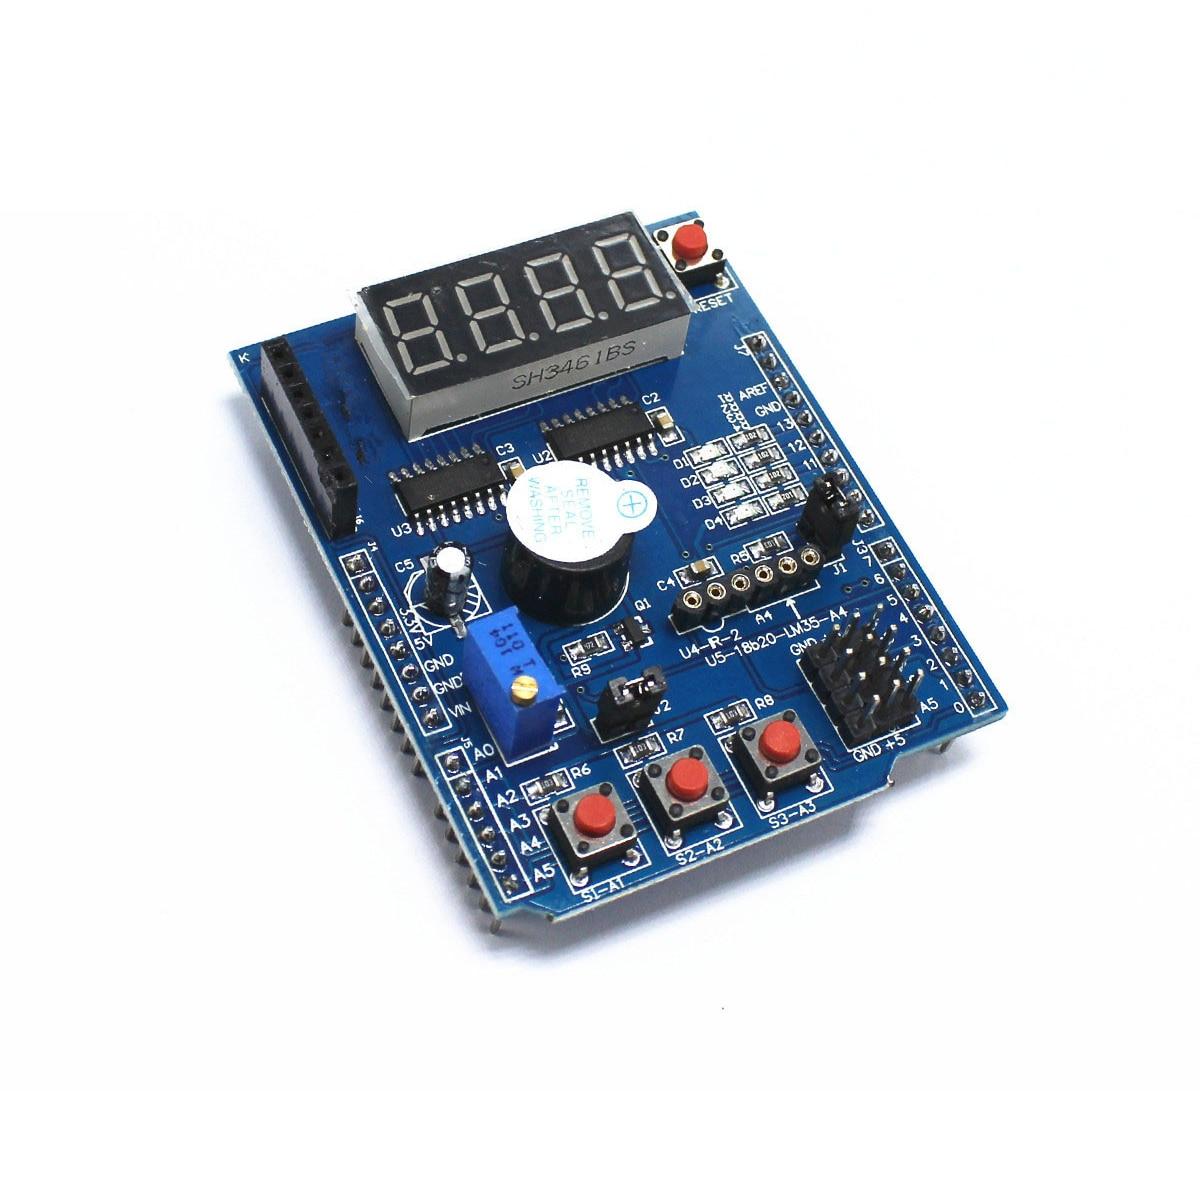 Multifuncional placa de expansión kit de aprendizaje para arduino UNO r3 LENARDO mega 2560 escudo